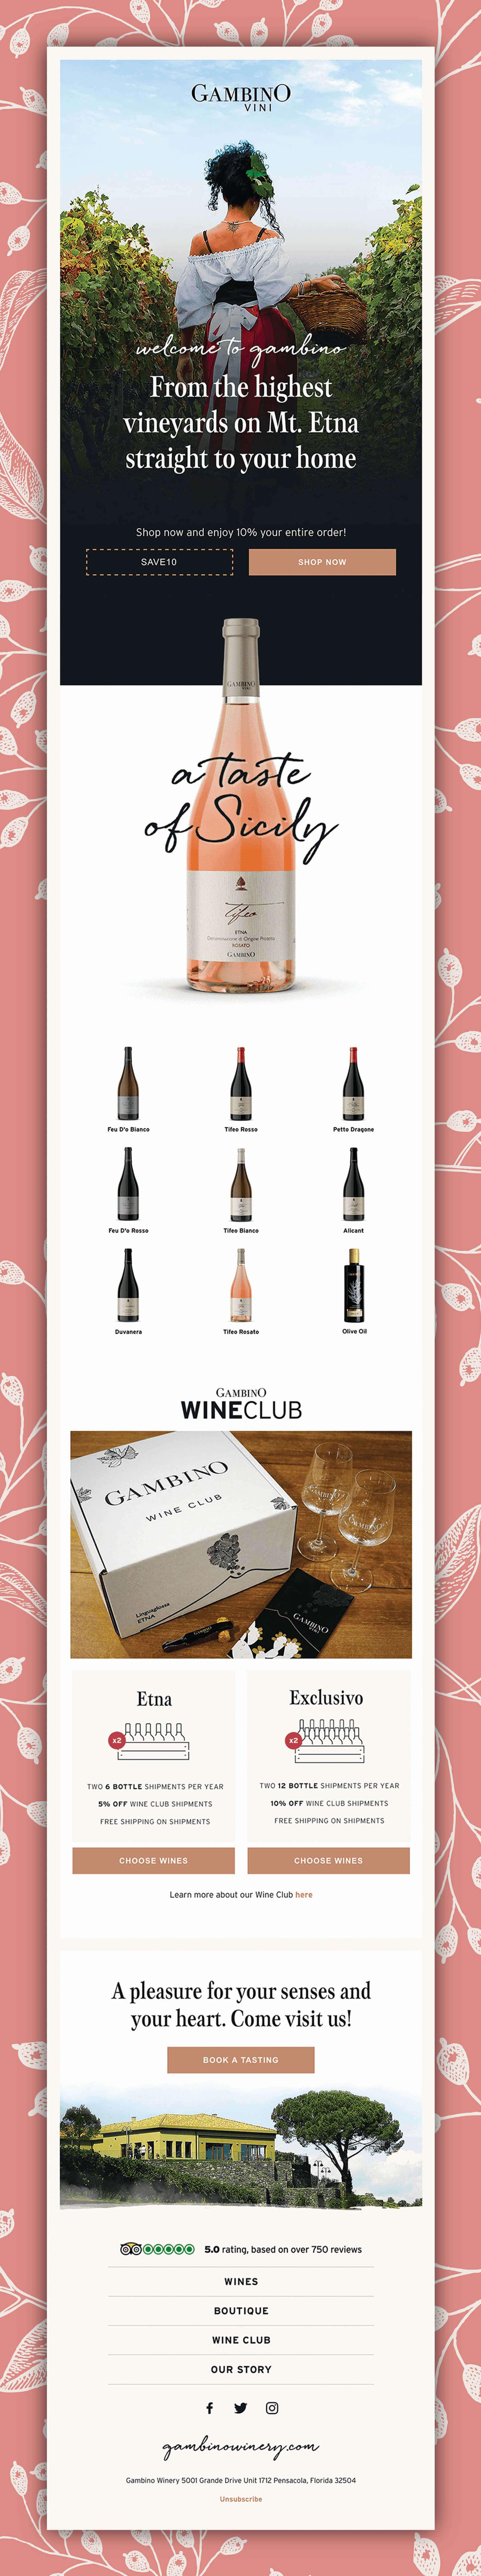 Klaviyo Email Marketing Design Featuring Alcohol & Spirits Brand Marketing